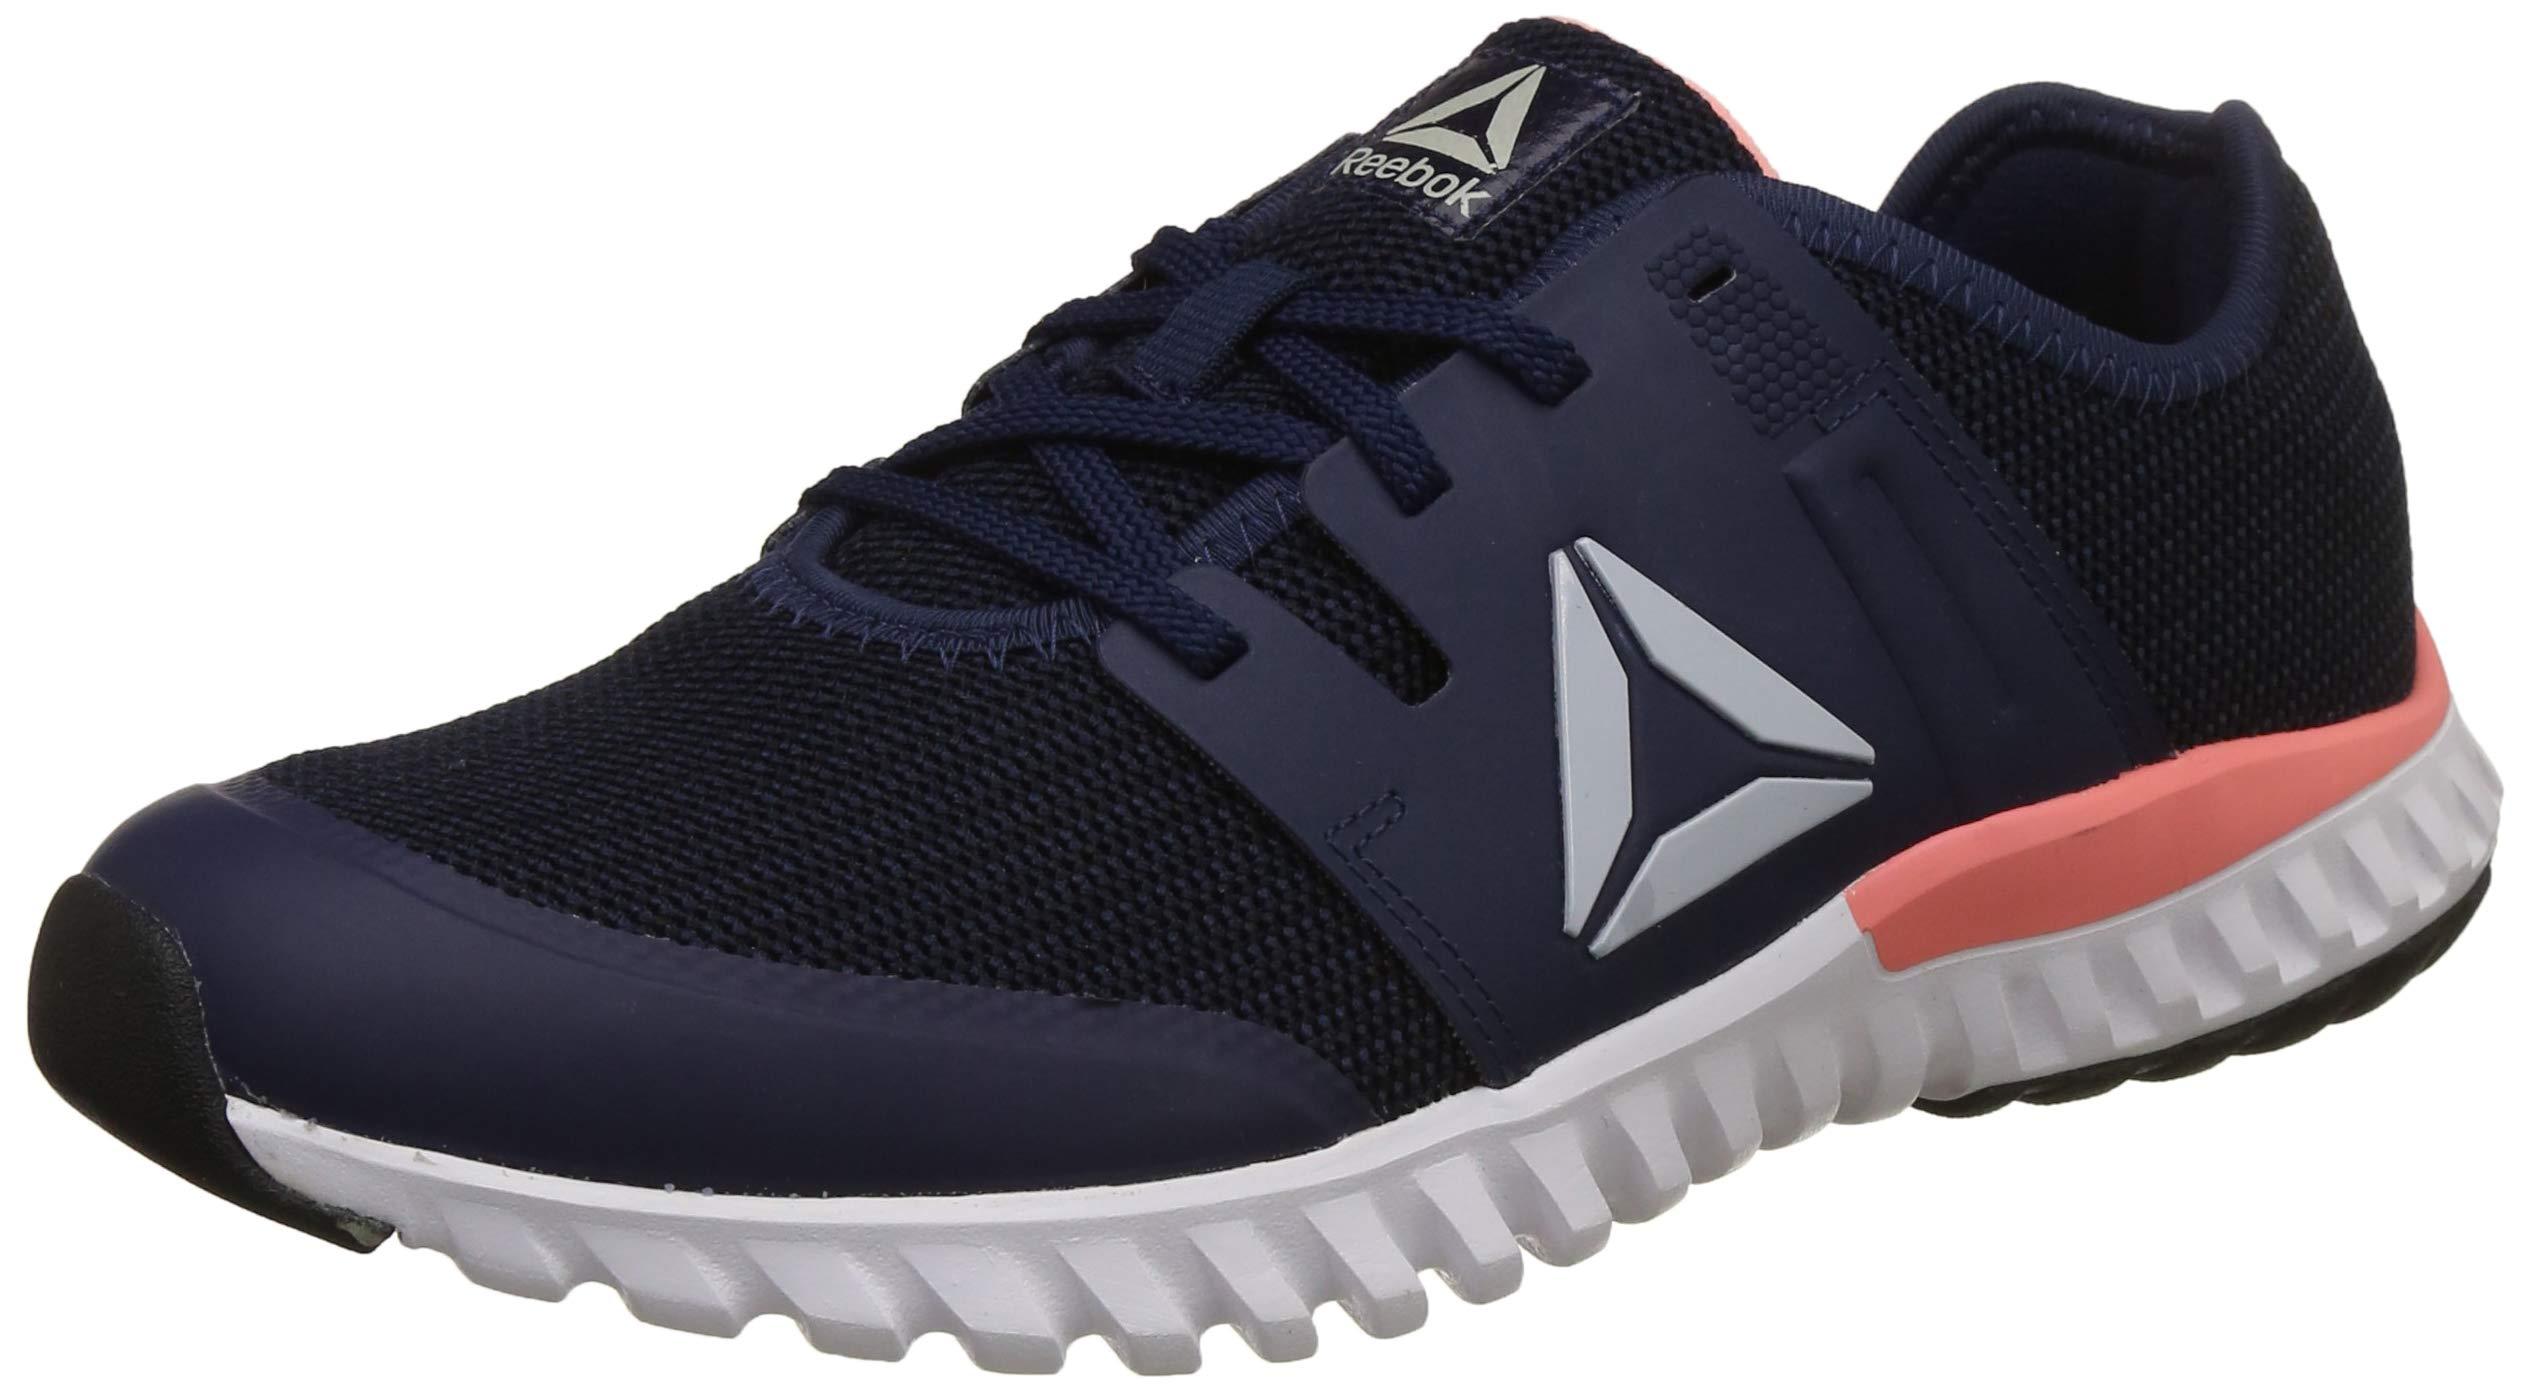 Reebok Women's Twist Lp Running Shoes